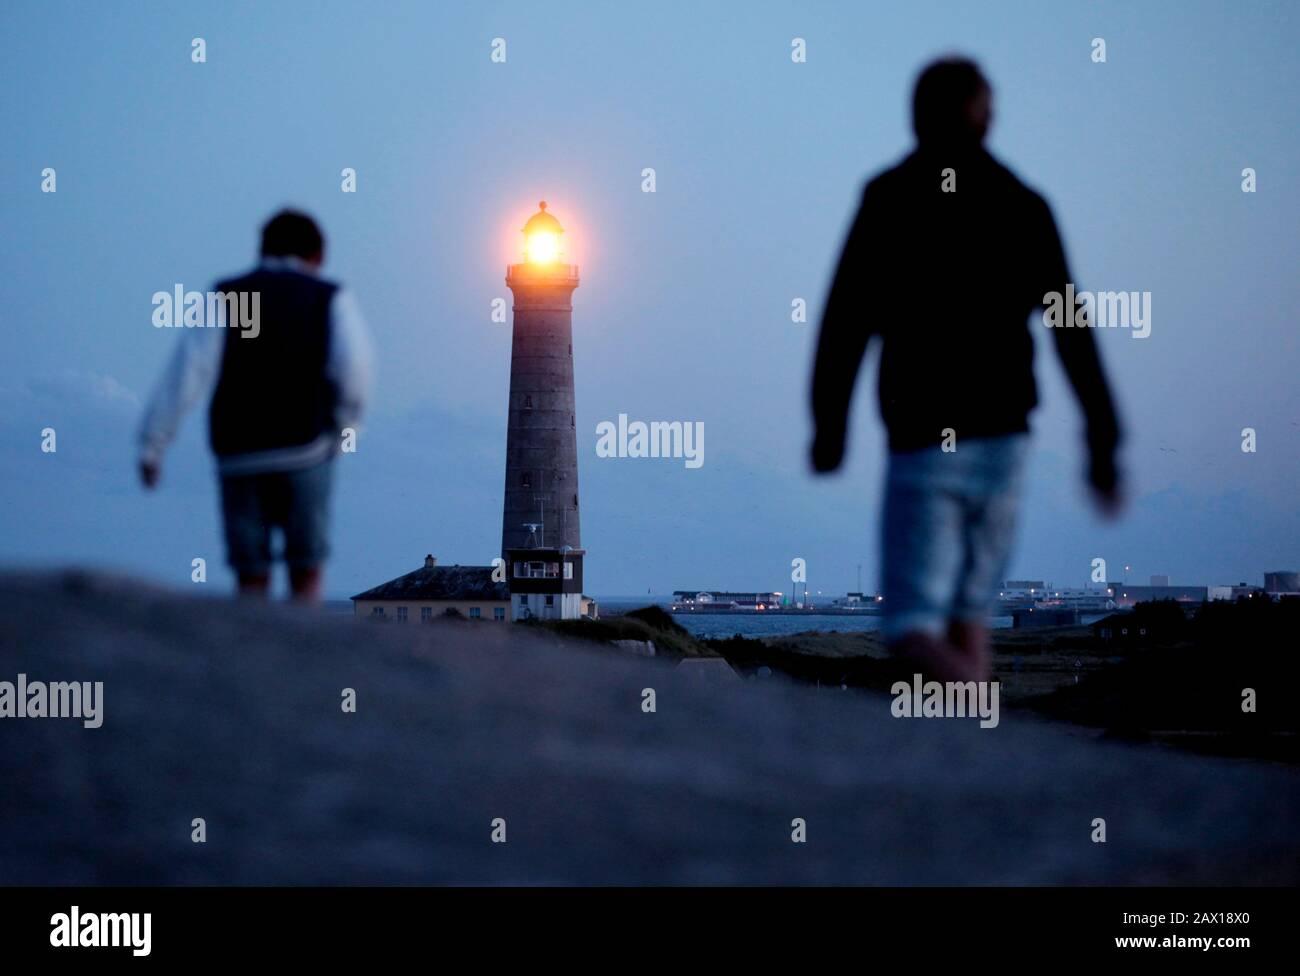 Skagen, Danemark 2012 phare de Skagen dans le nord du Danemark. Photo Jeppe Gustafsson Banque D'Images